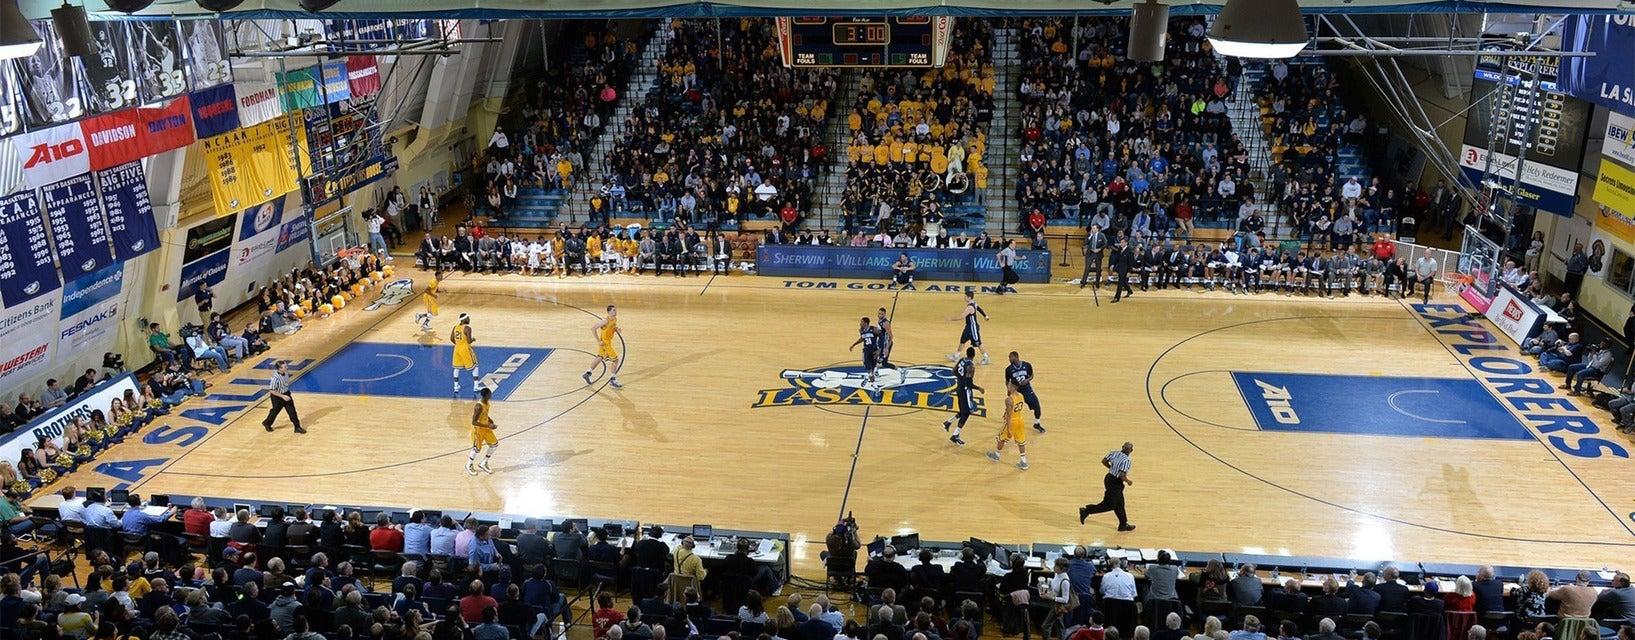 La Salle Basketball Tickets